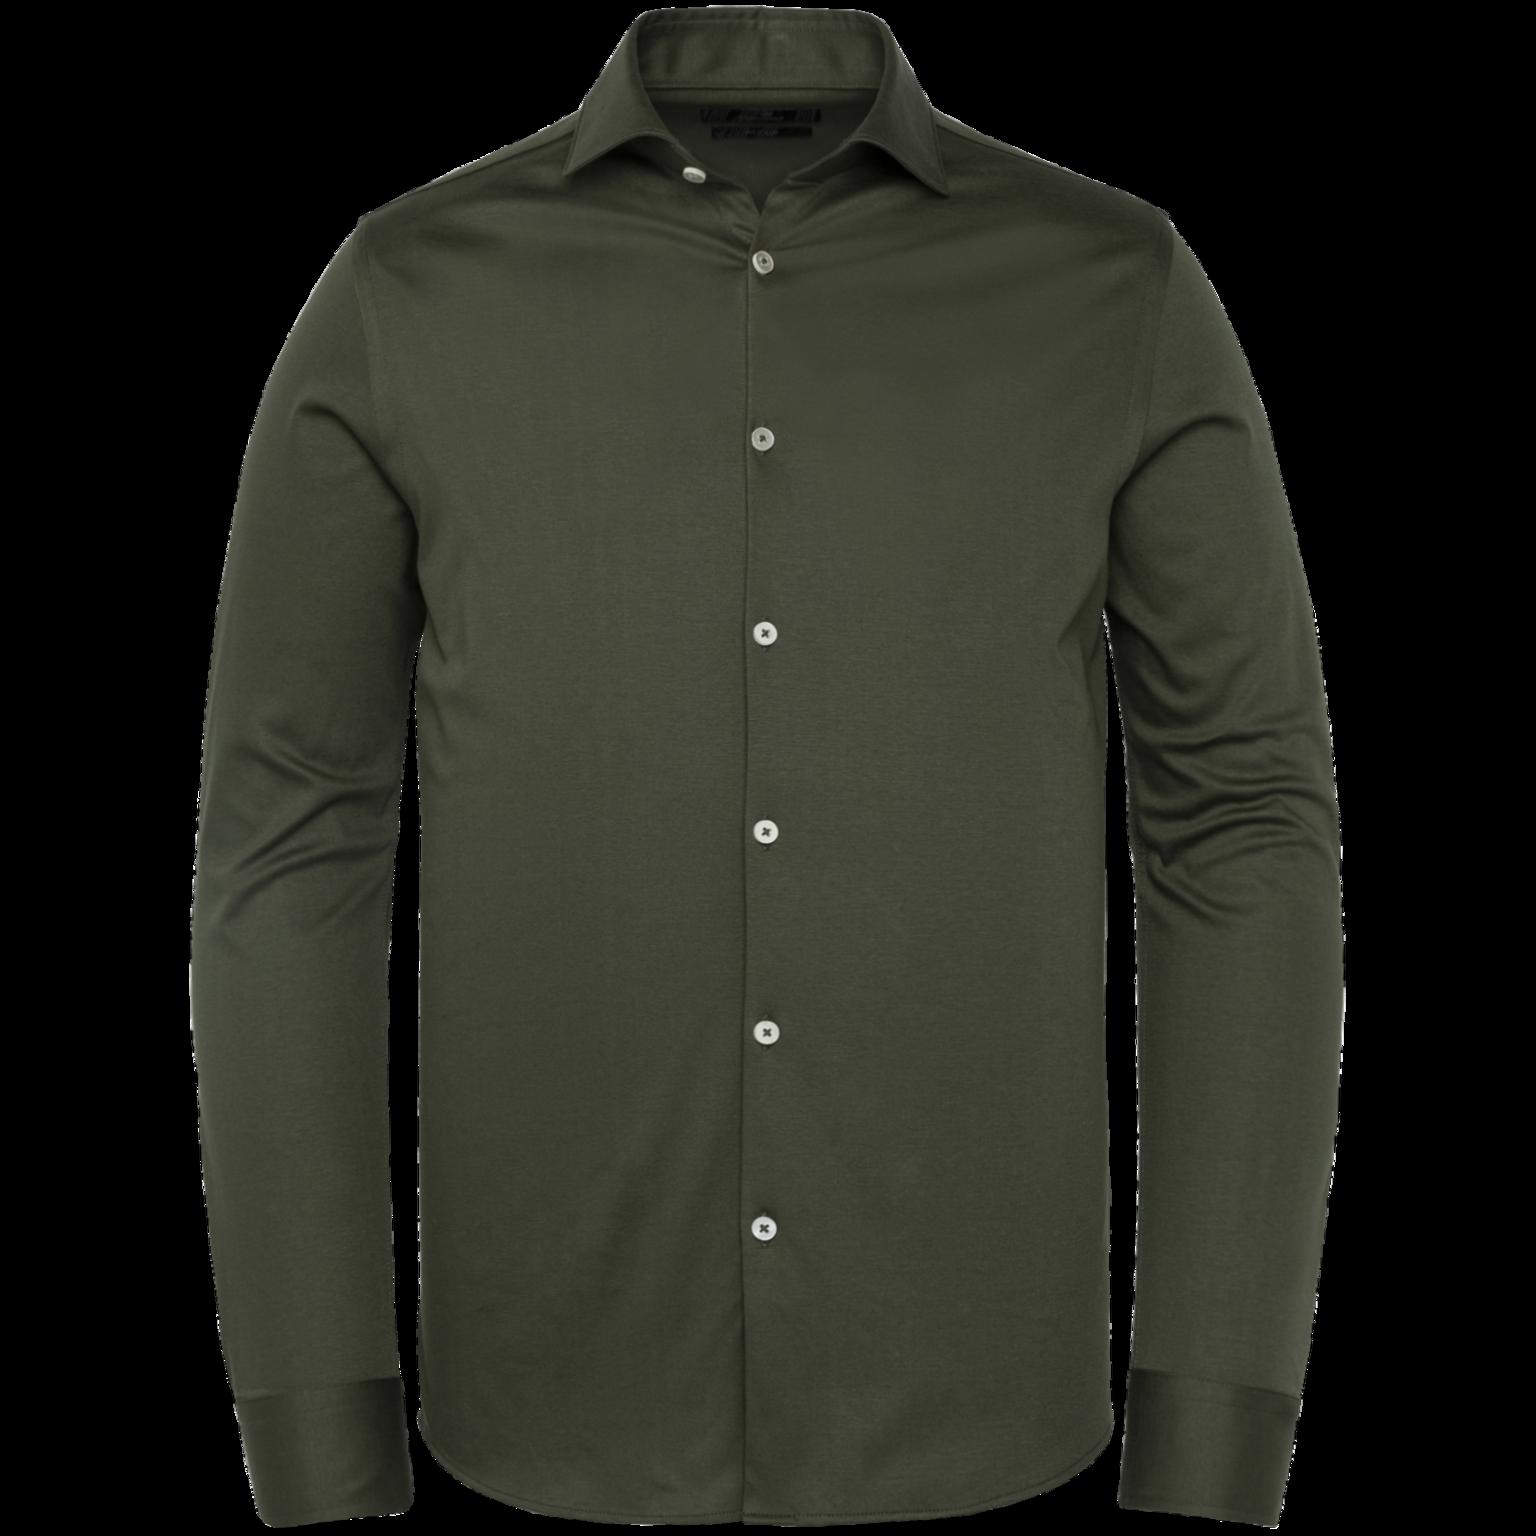 VANGUARD chemise longues manches jersey-5